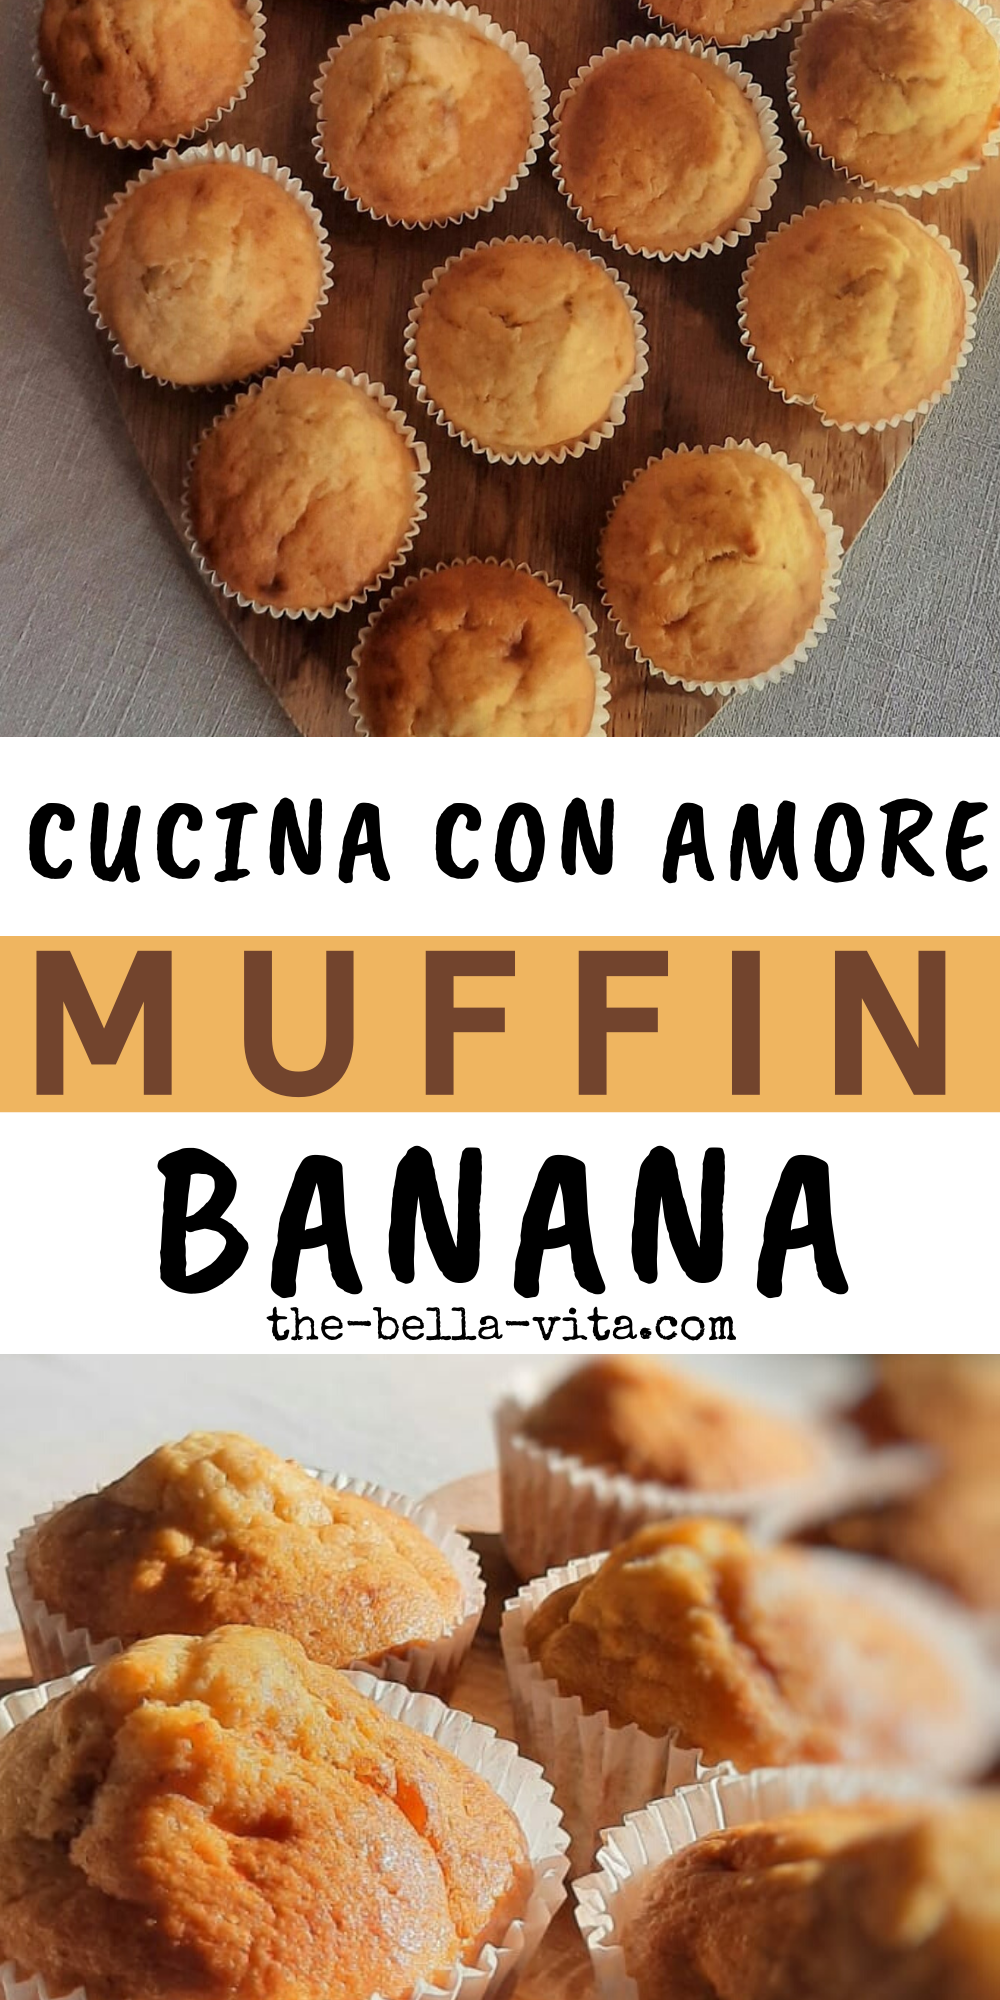 Ricetta Muffin Alla Banana.Muffin Alla Banana Anacardi Ricetta Super Veloce Ricetta Ricette Muffin Alla Banana Ricette Di Cucina